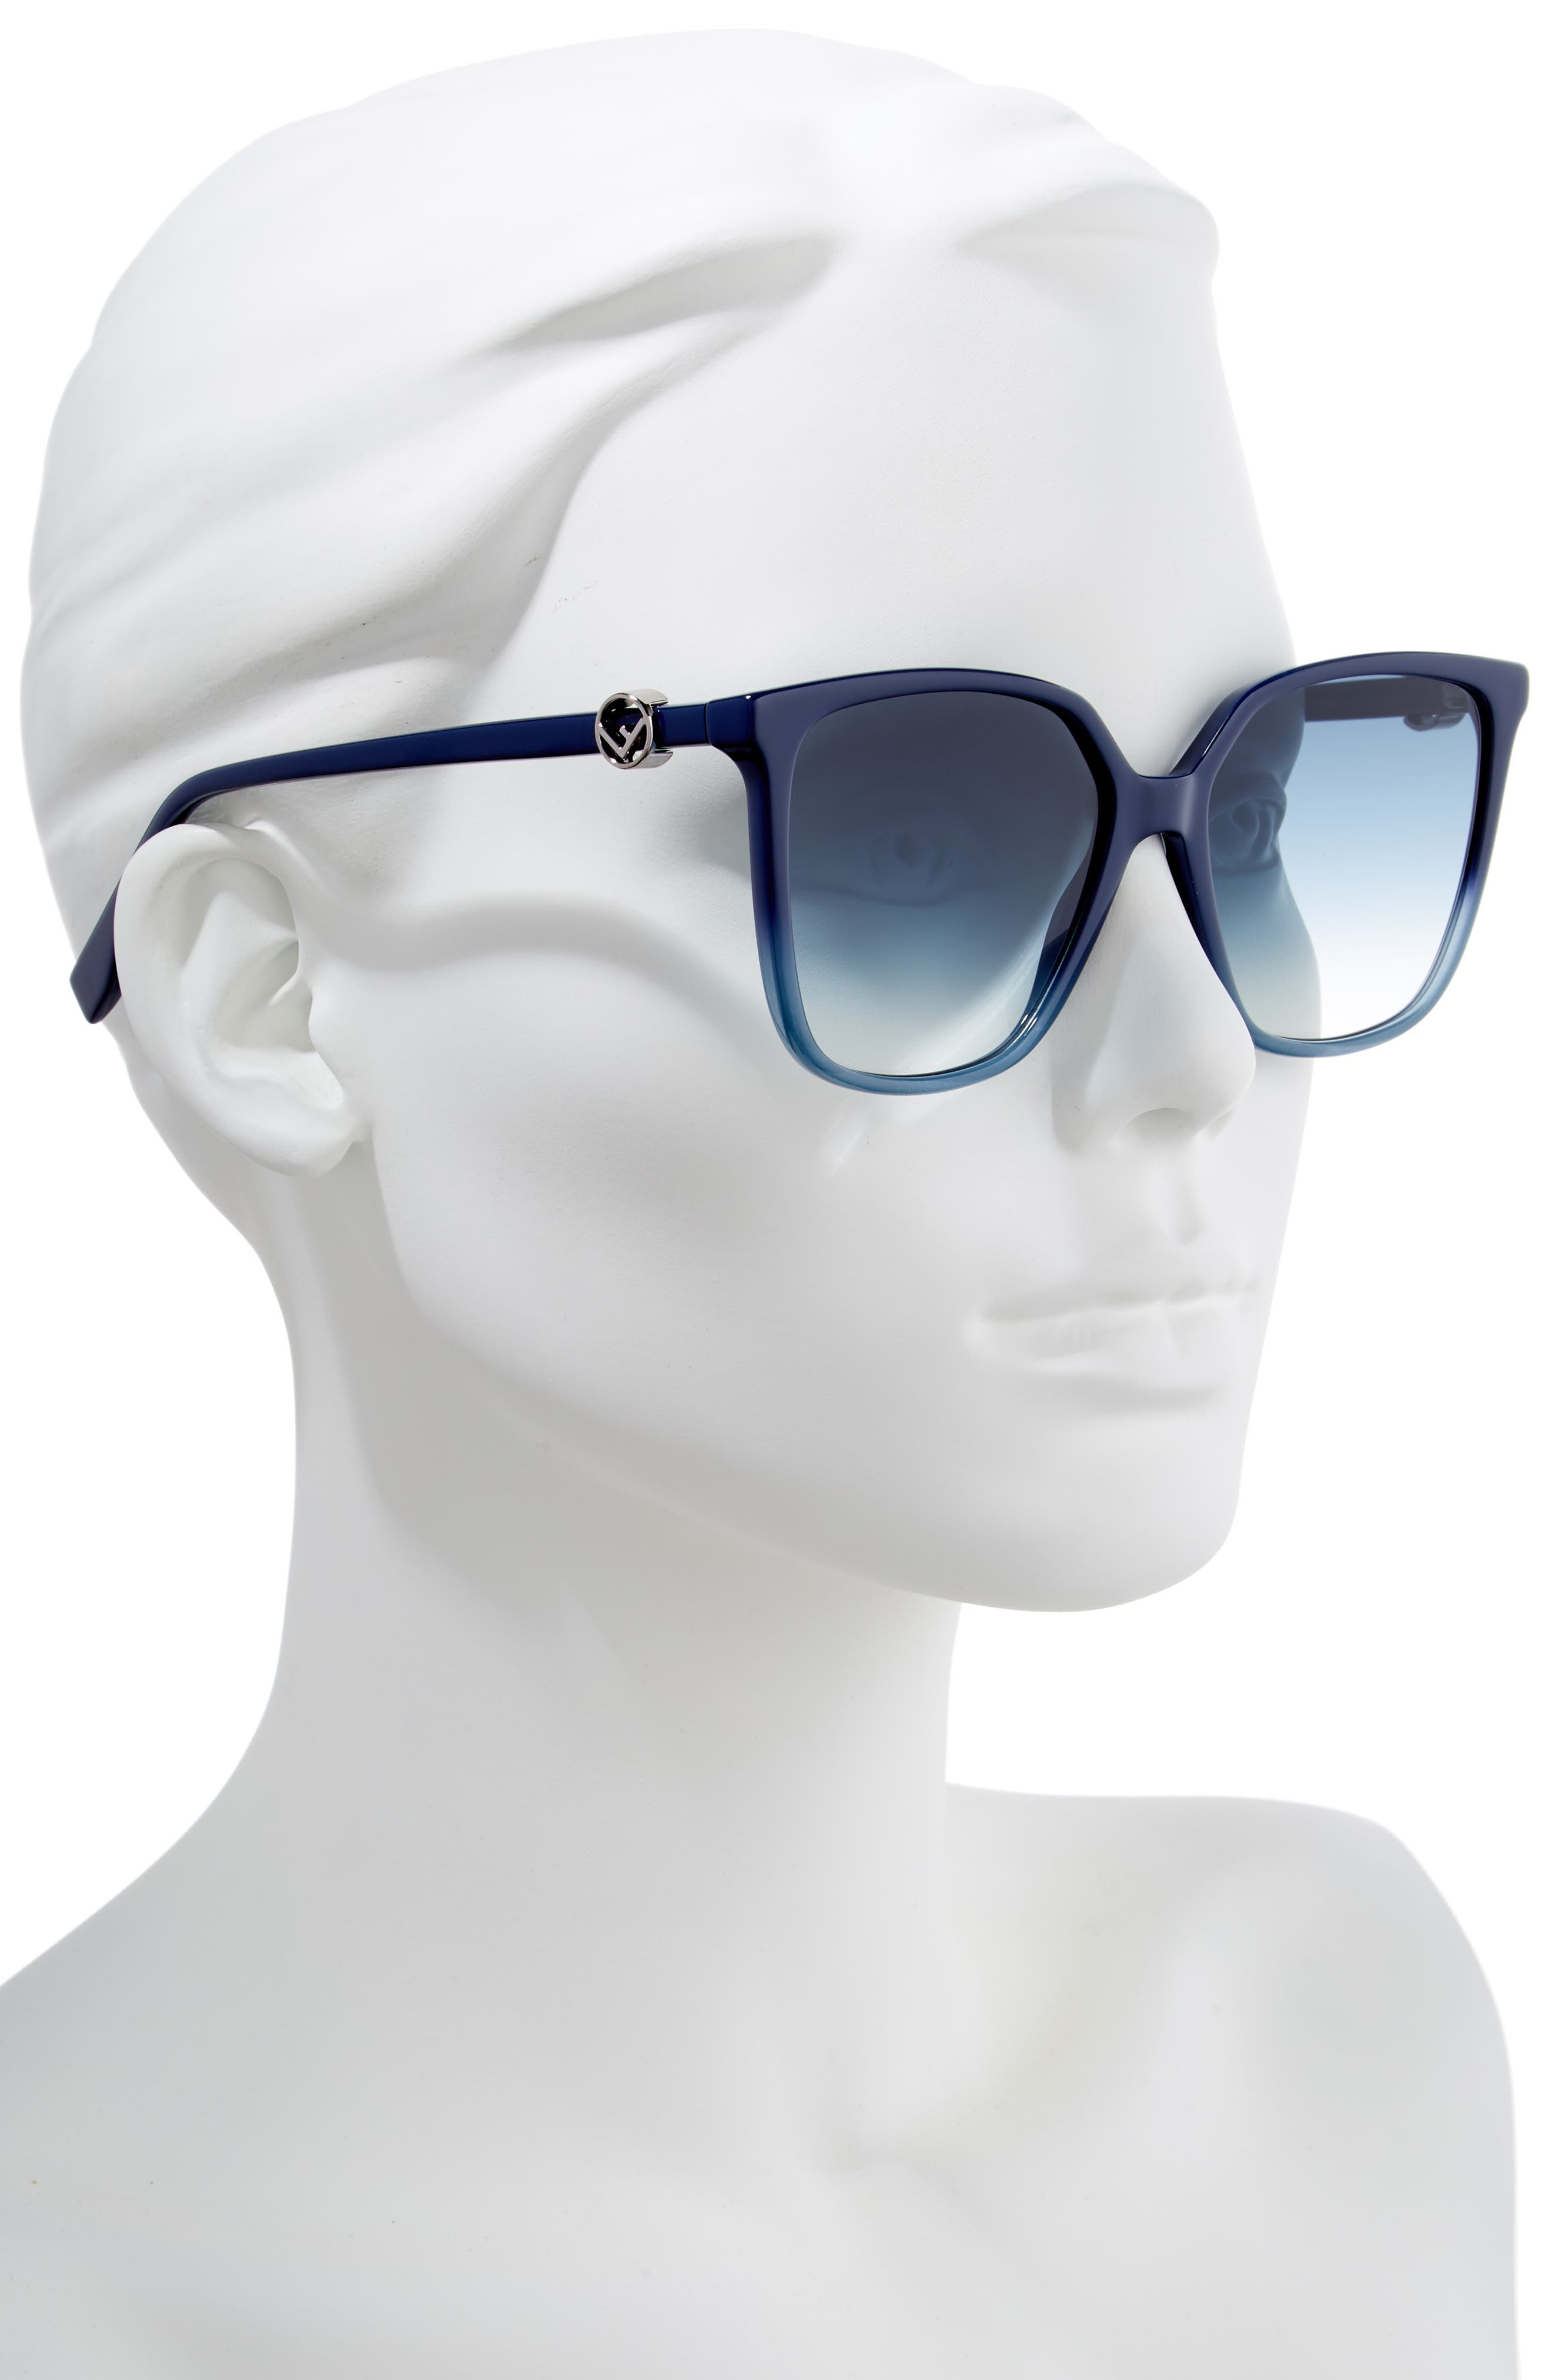 57mm Sunglasses,                             Alternate thumbnail 2, color,                             BLUE